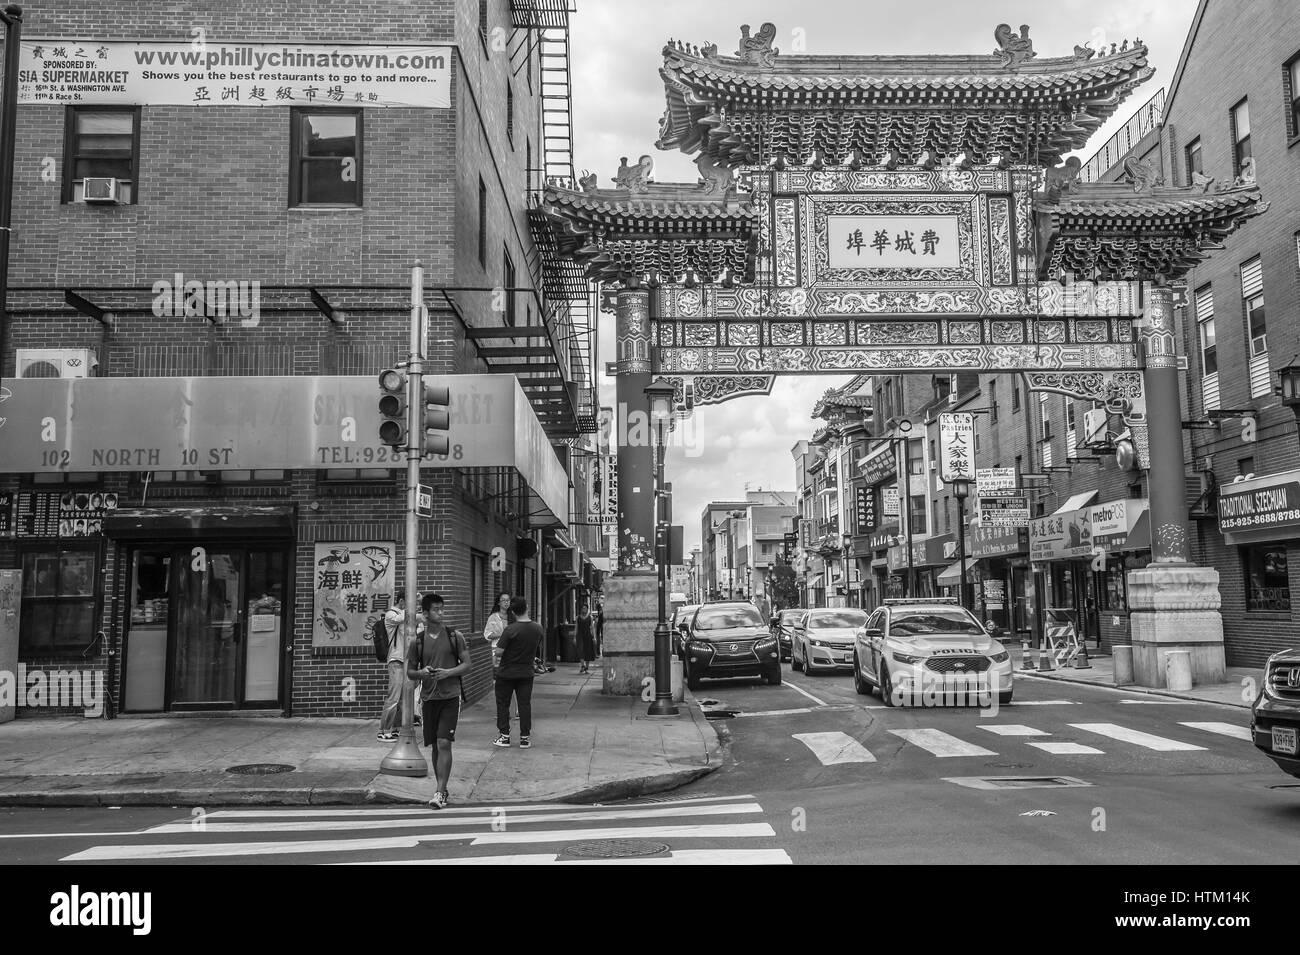 Chinese Friendship Arch, Gate, Chinatown, Philadelphia, Pennsylvania, USA - Stock Image